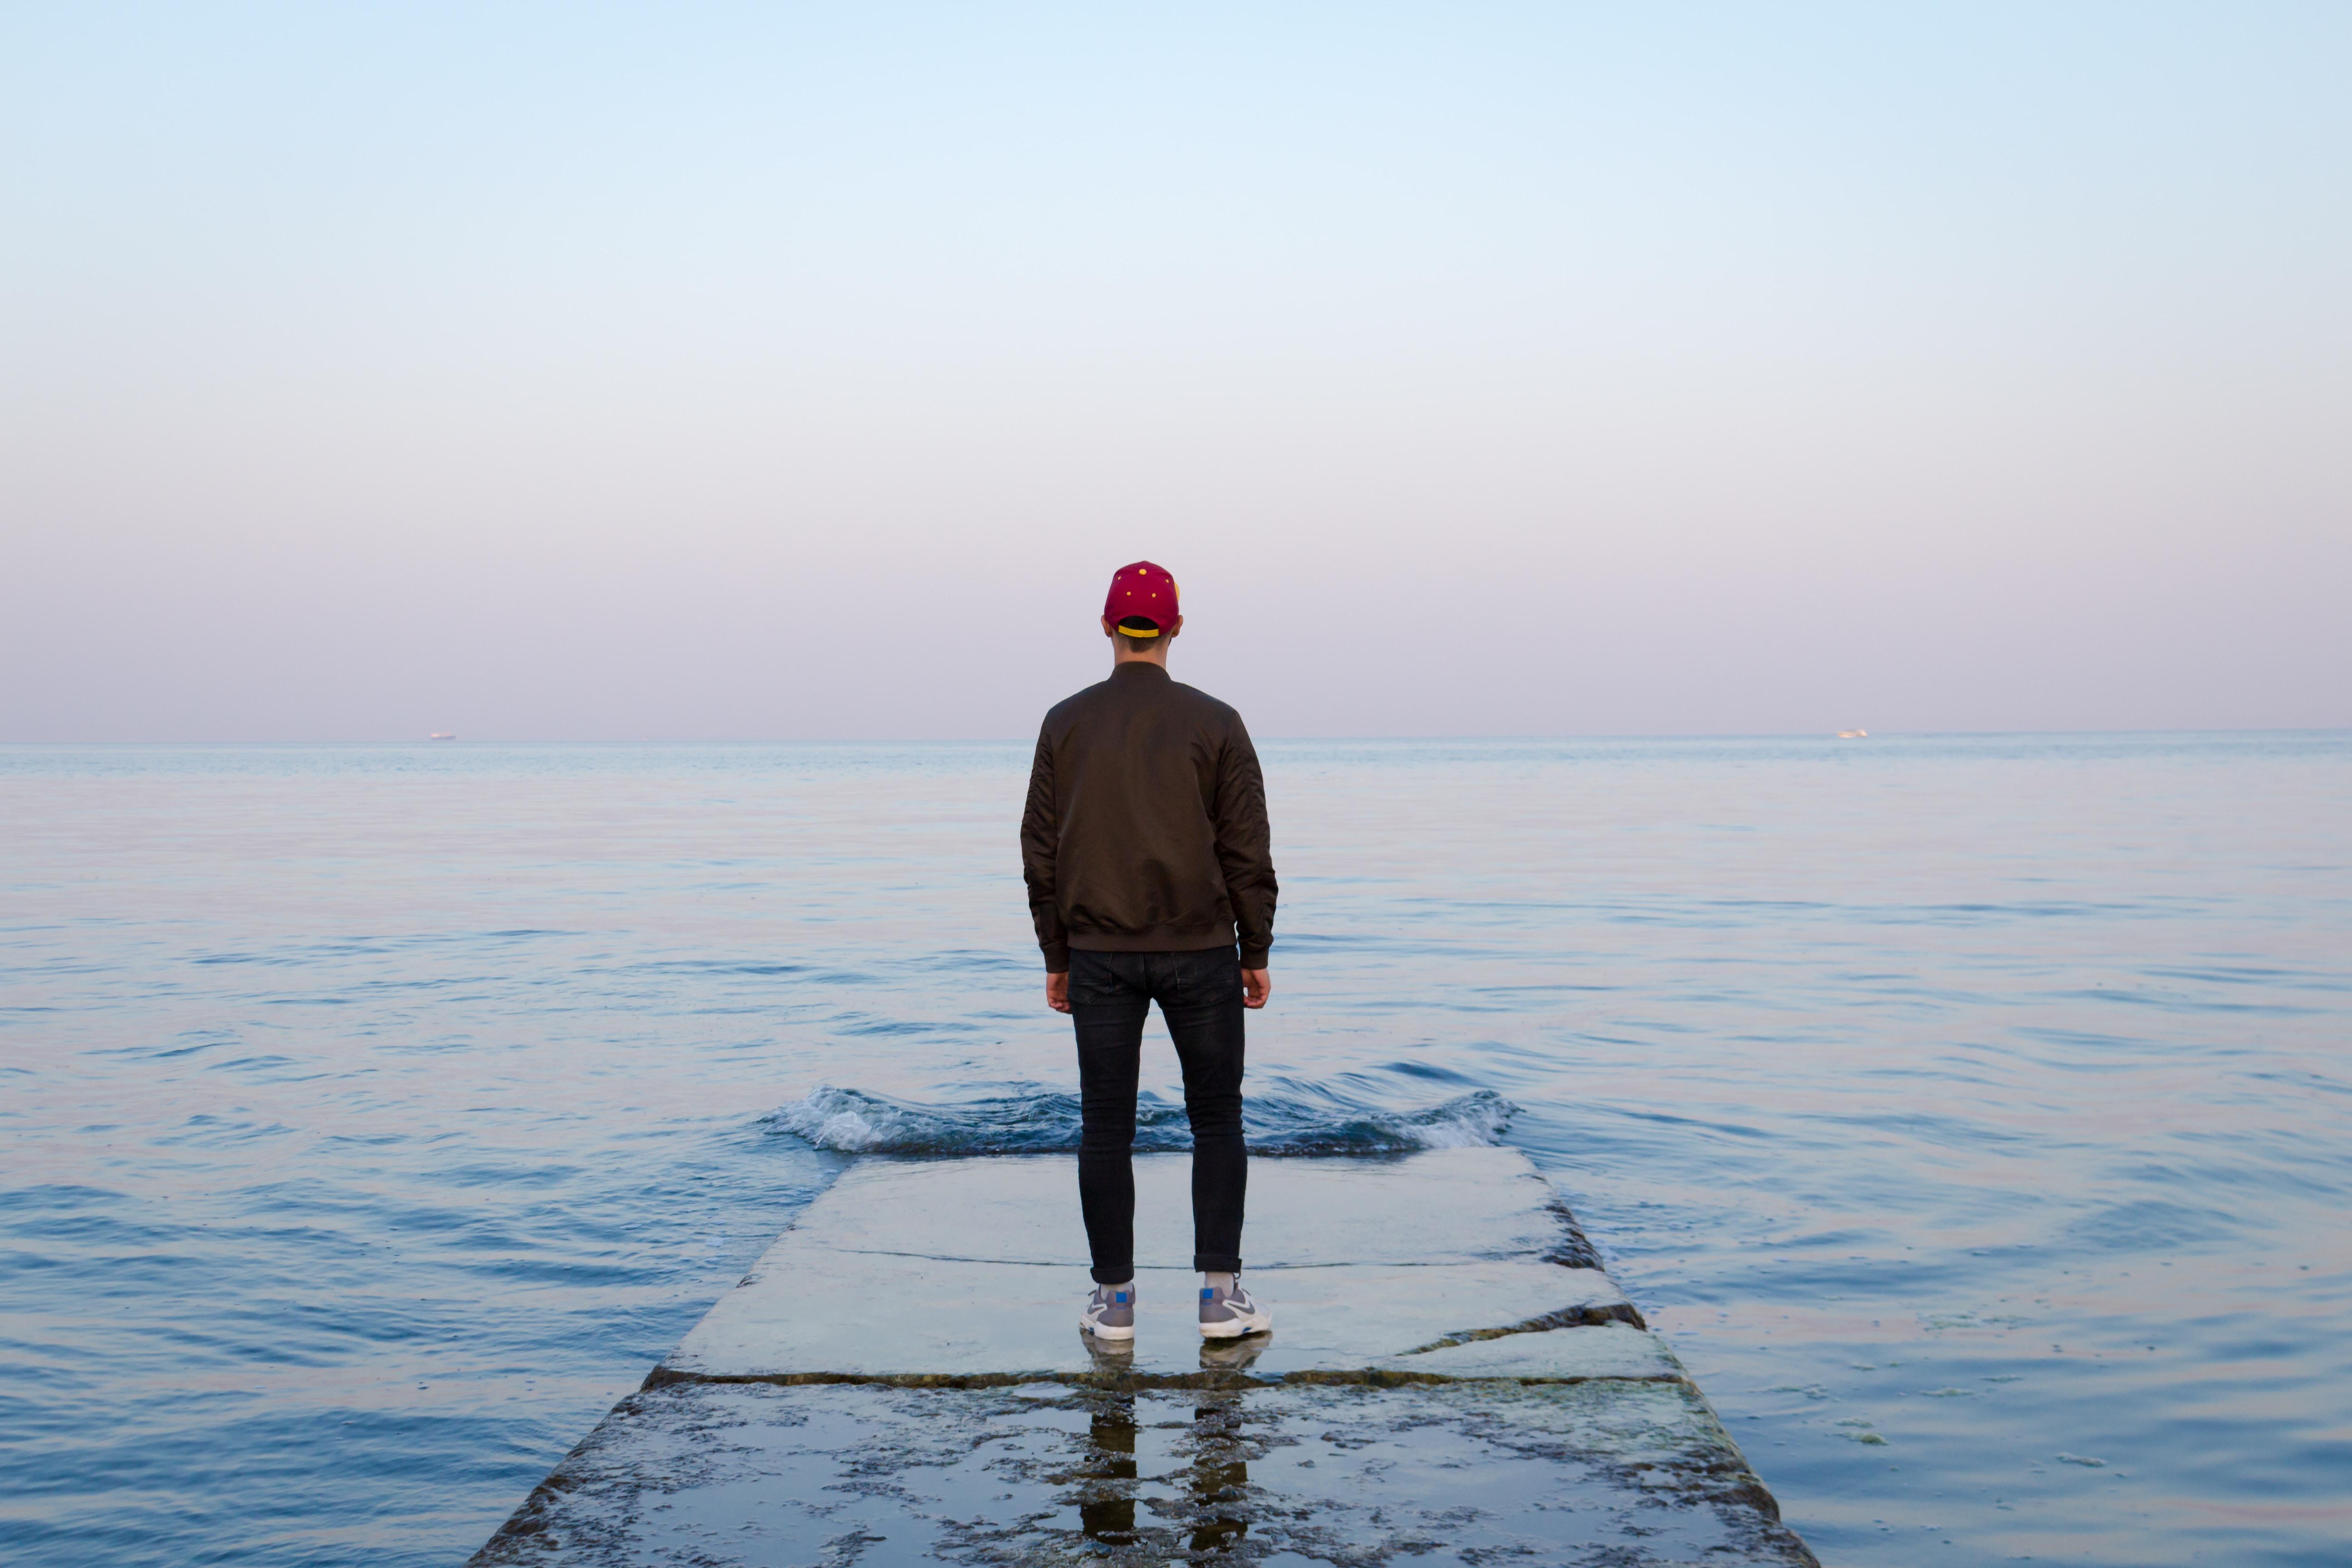 man standing on concrete dock facing sea